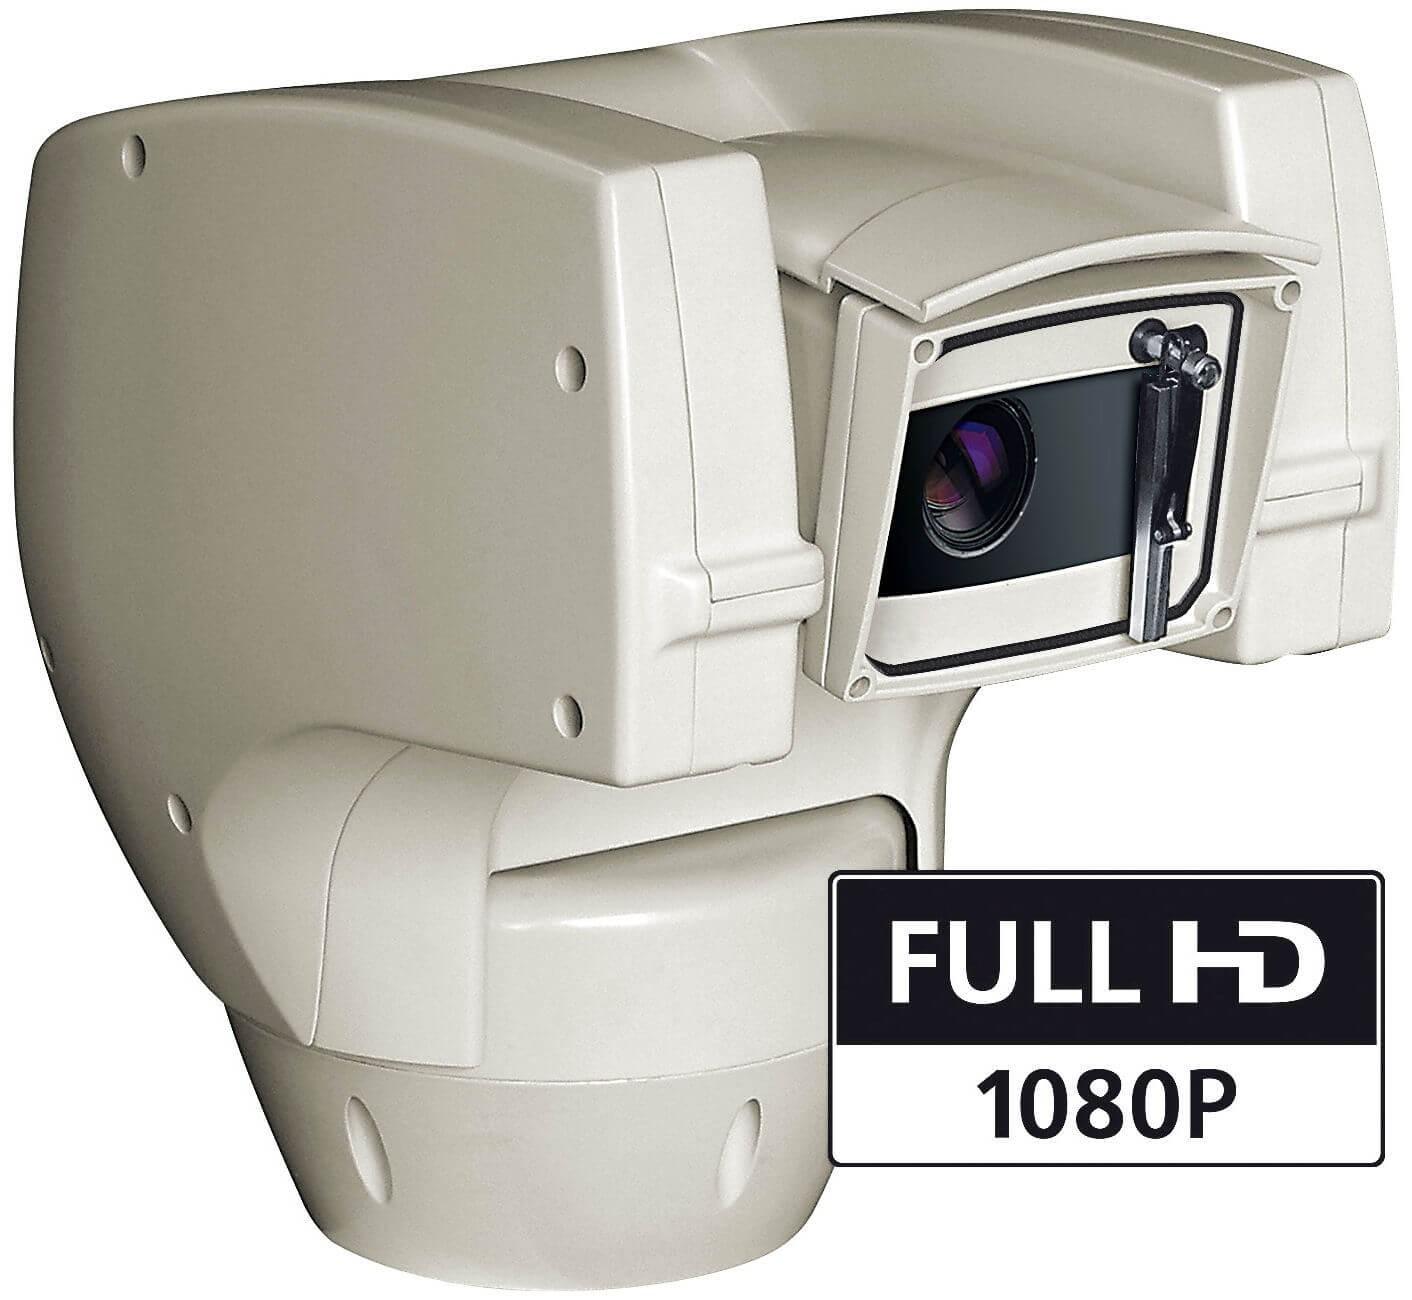 Videotec UCHD11WAZ00B Ulisse Compact Delux